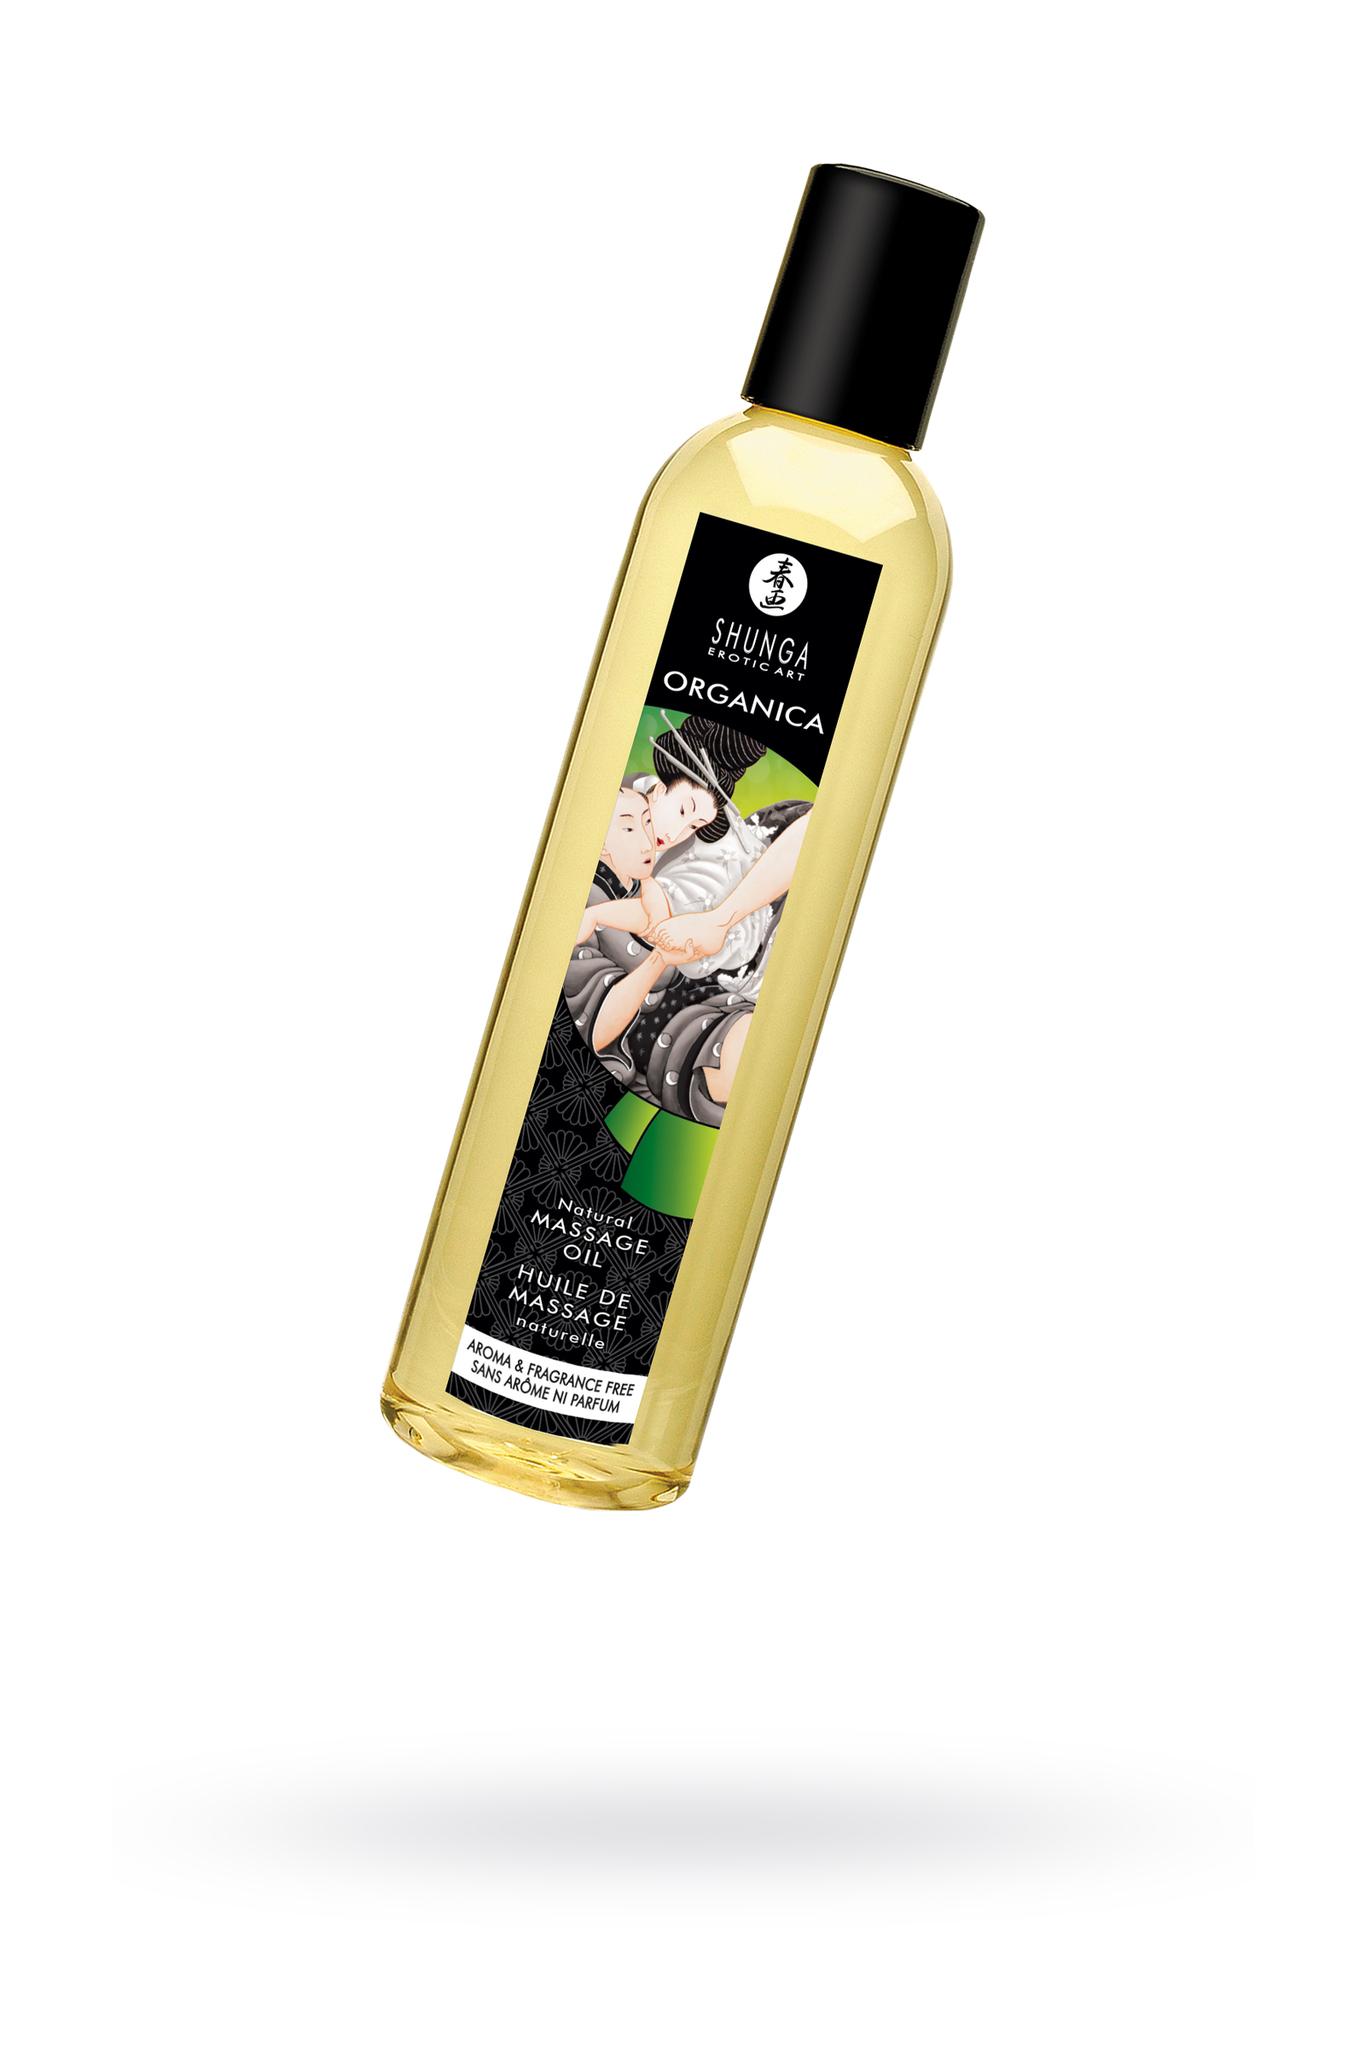 Масло для массажа Shunga Organica Aroma and Fragrance Free, натуральное, возбуждающее, без аромата, 250 мл фото